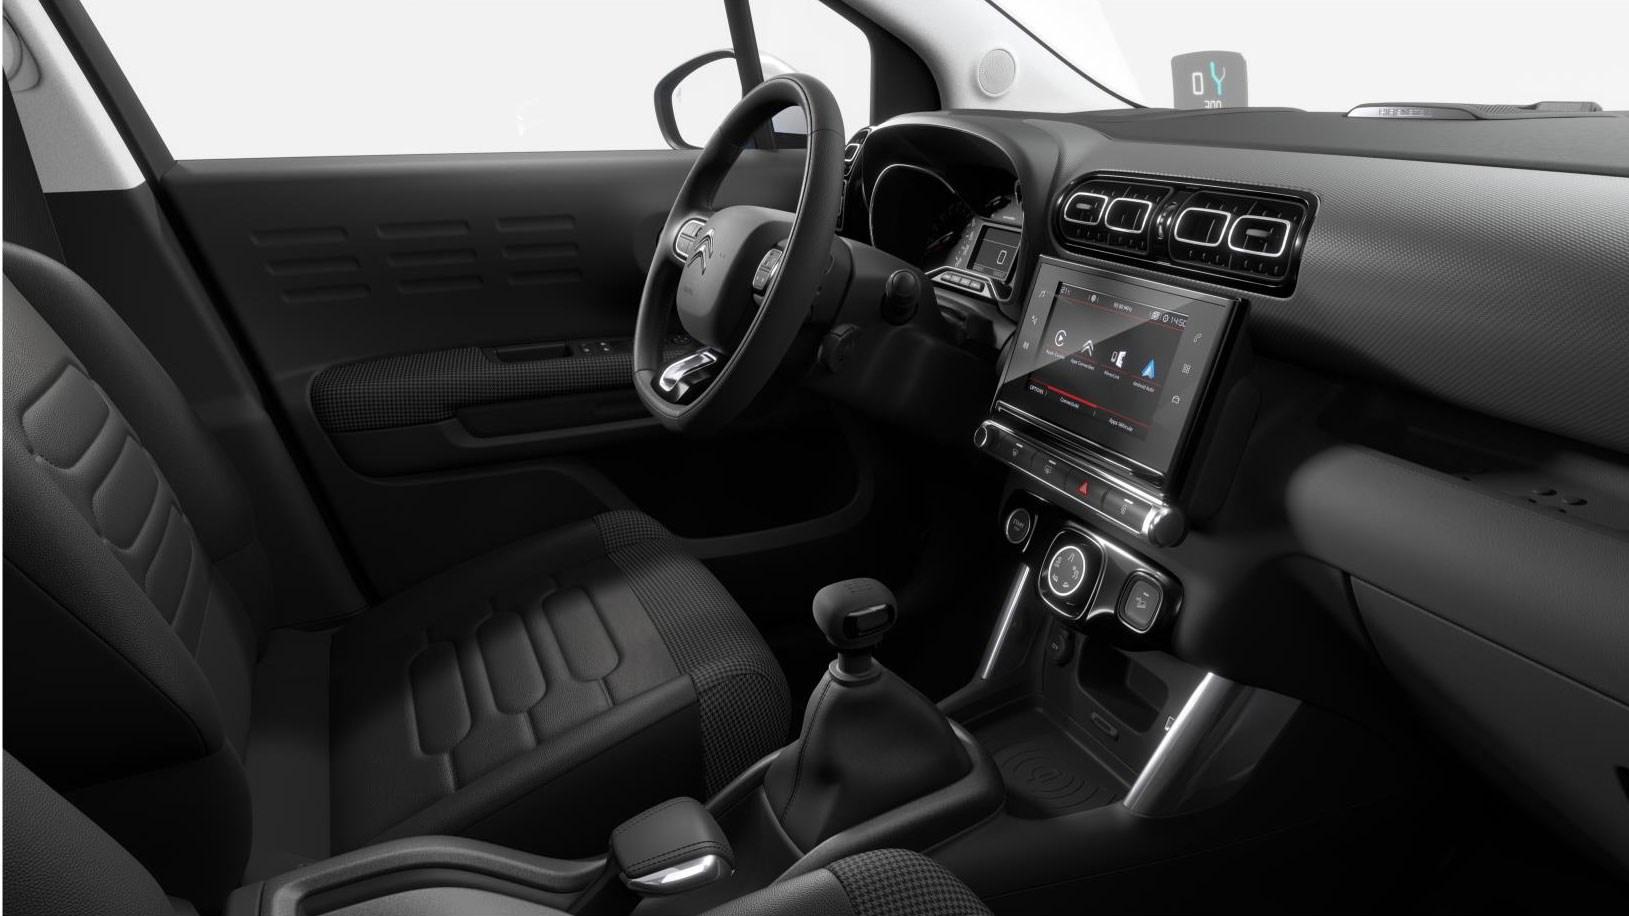 Citroen C3 Aircross interior: a comfort-biased cabin